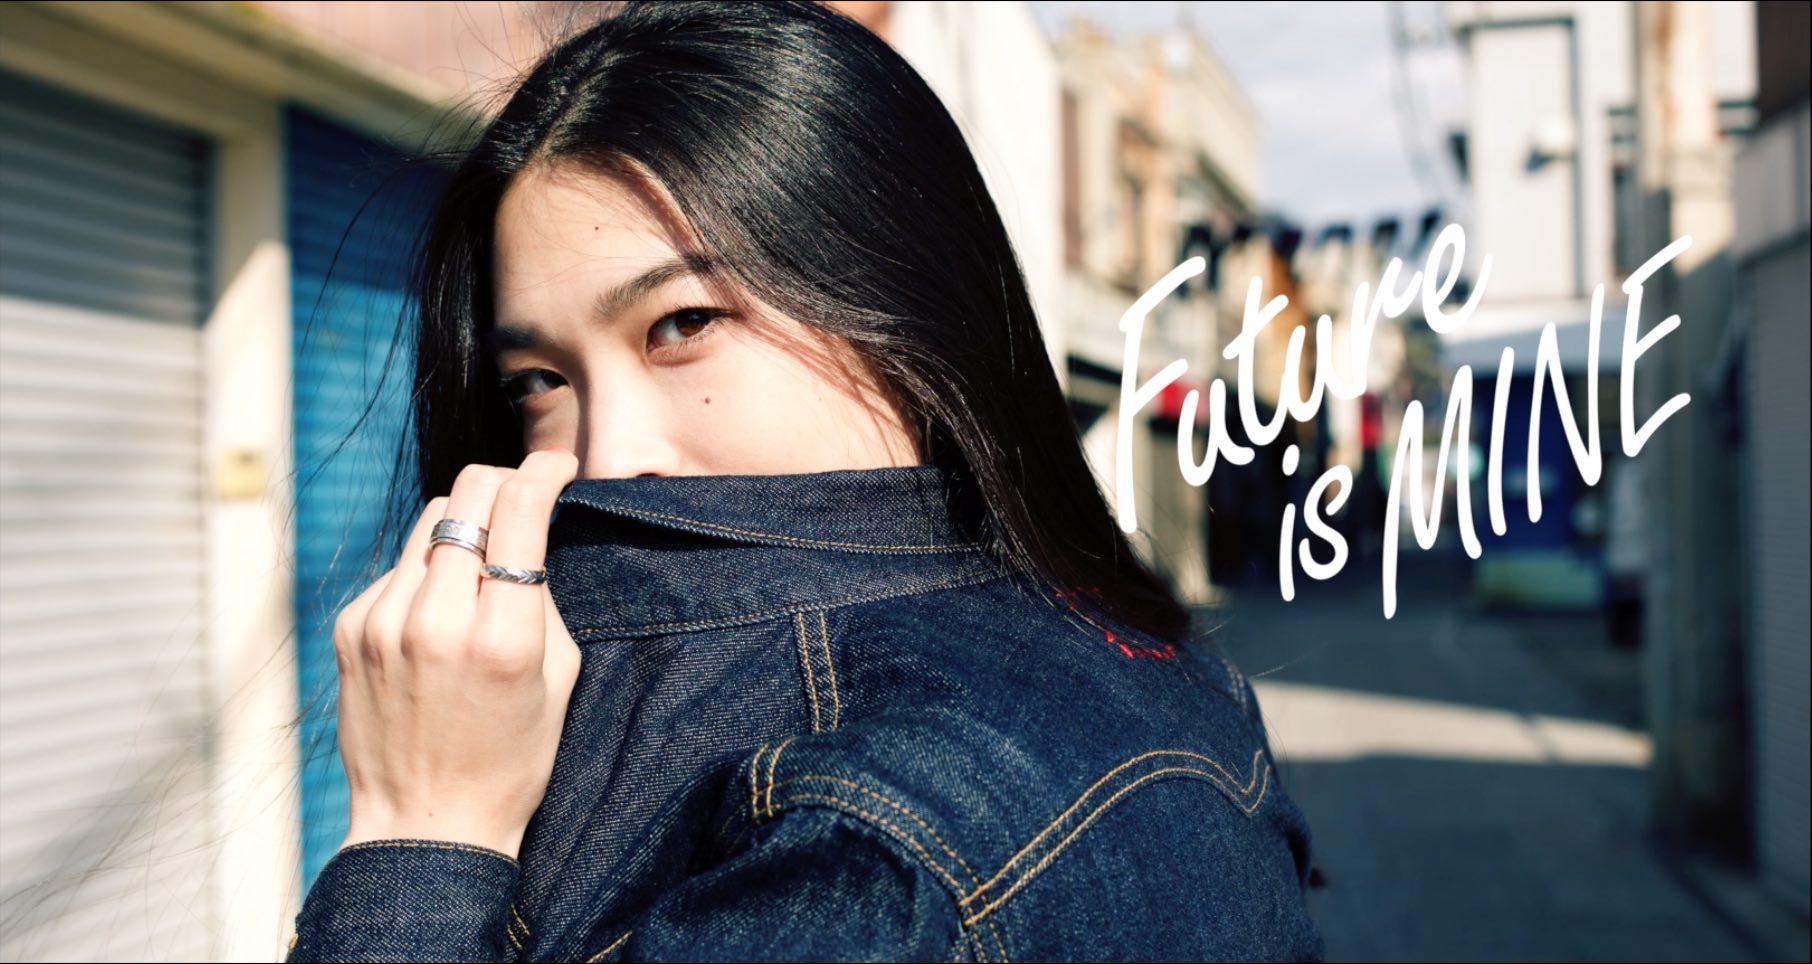 【Future is MINE 井上智絵編 #1】 オンリーワンを目指すための旅 in岡山